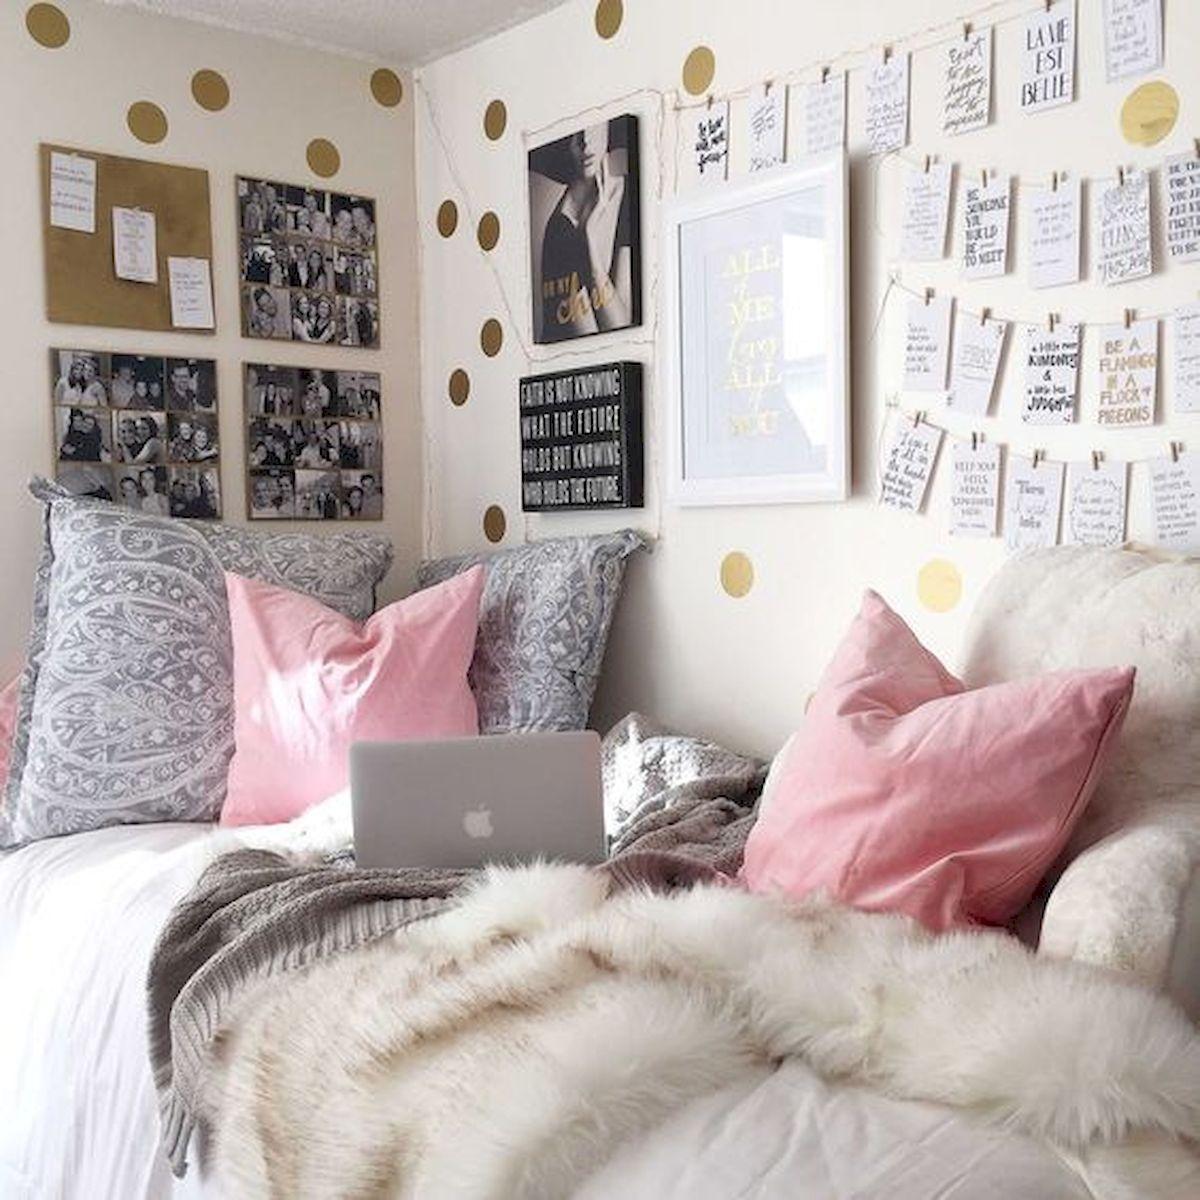 25 Best Simple DIY Home Decor (1)